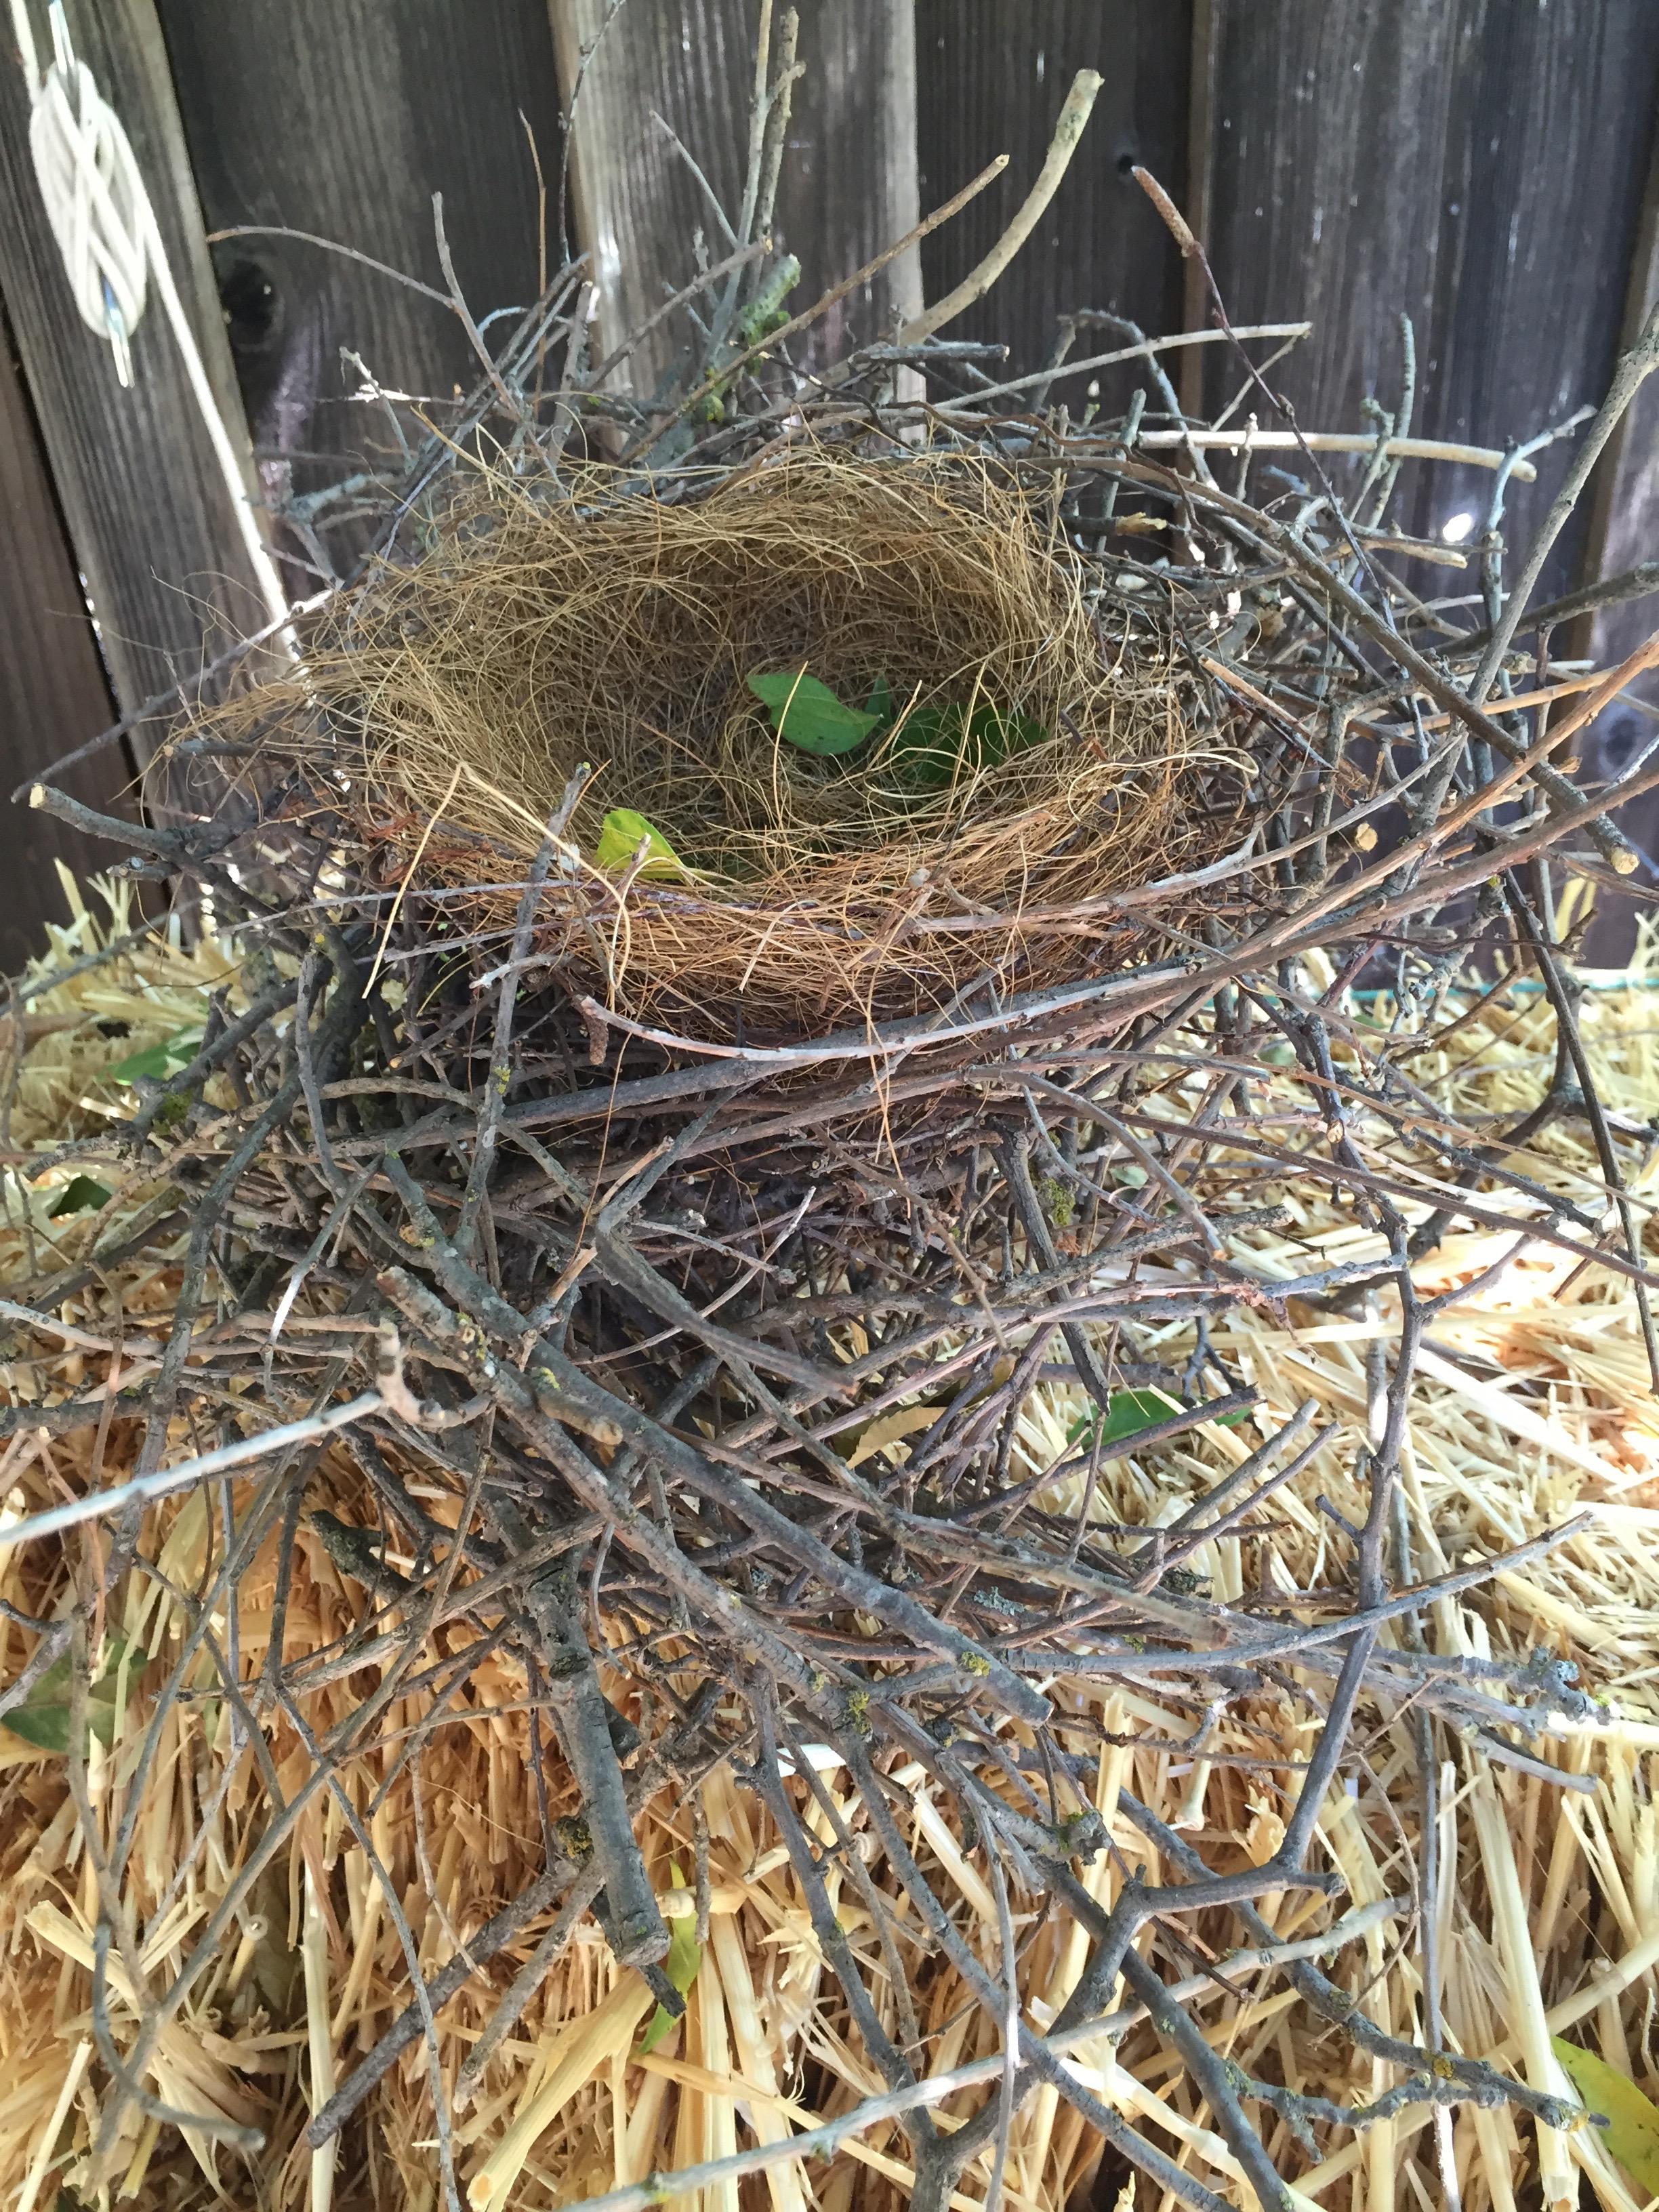 Scrub Jay nest found in the privet